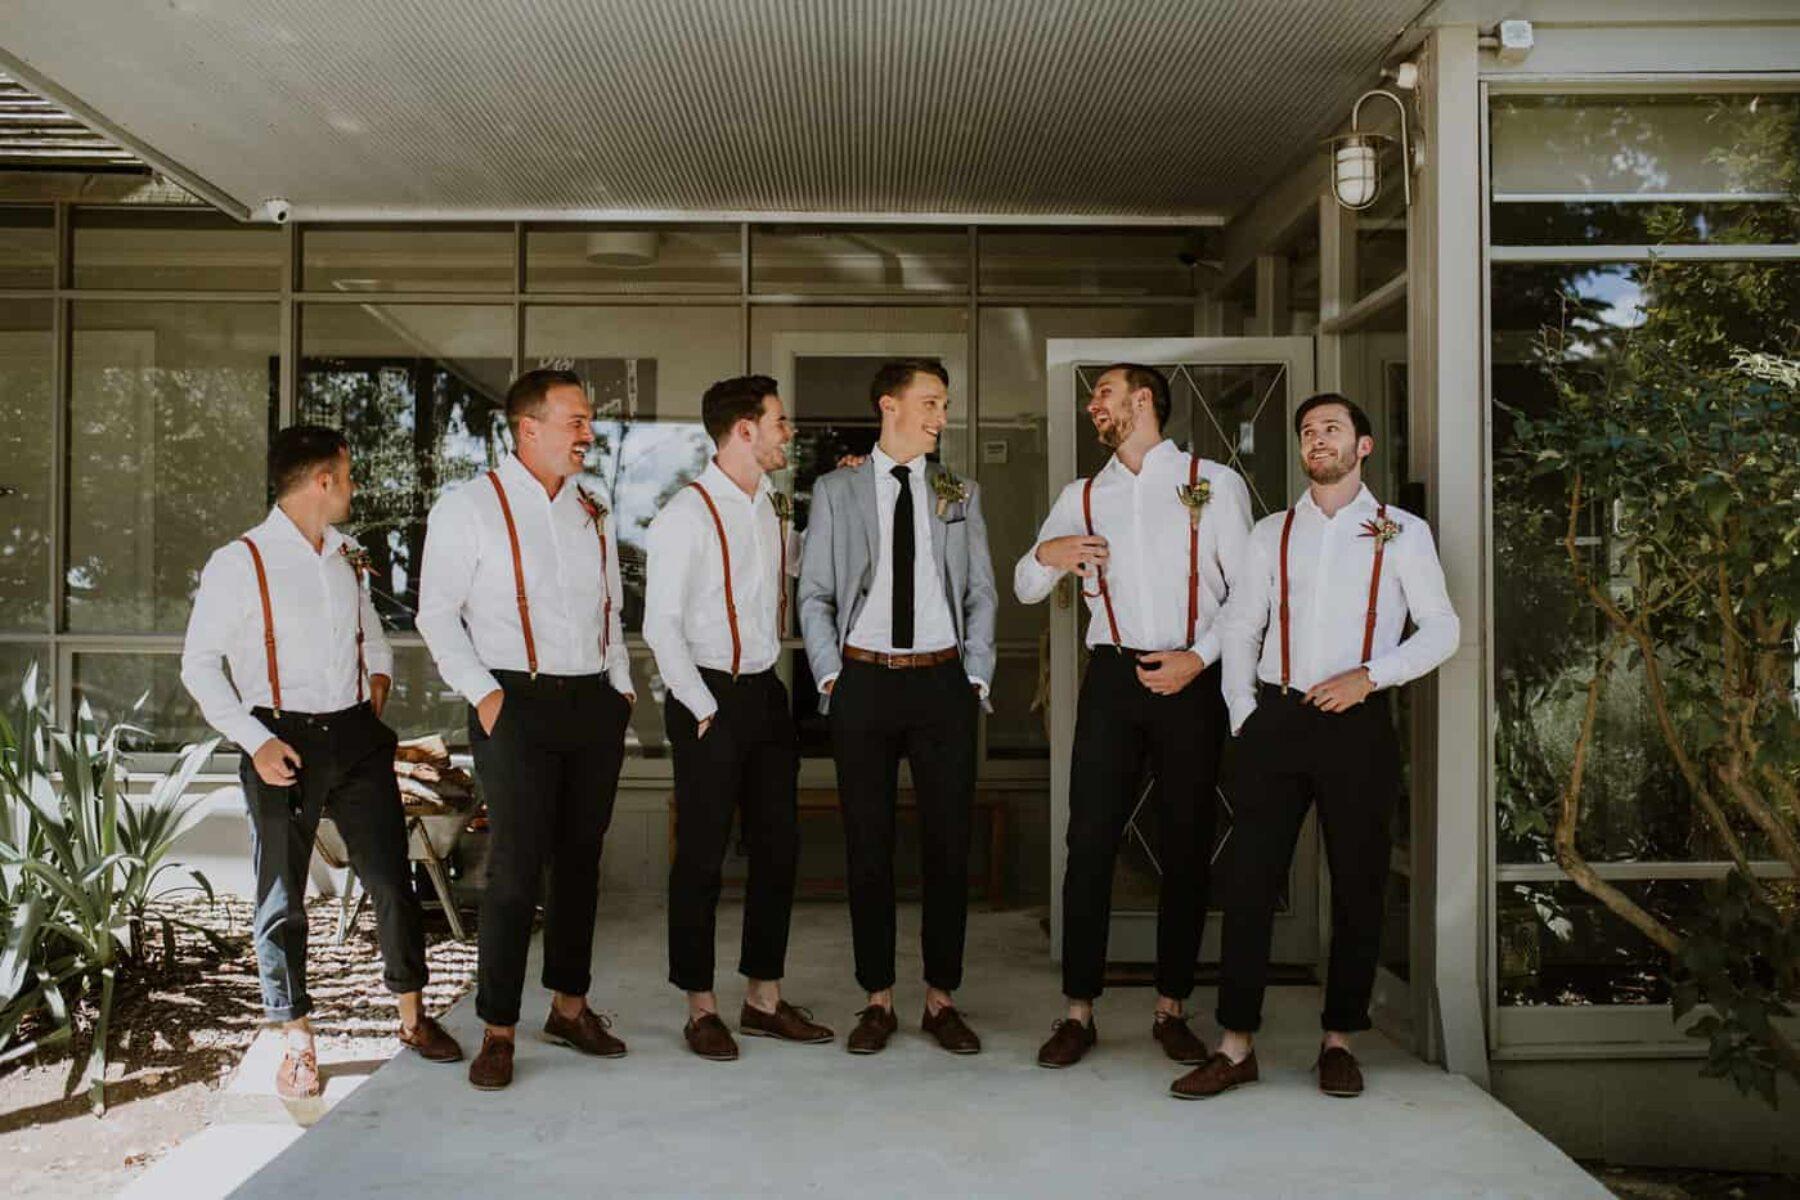 dapper groom and casual groomsmen in braces